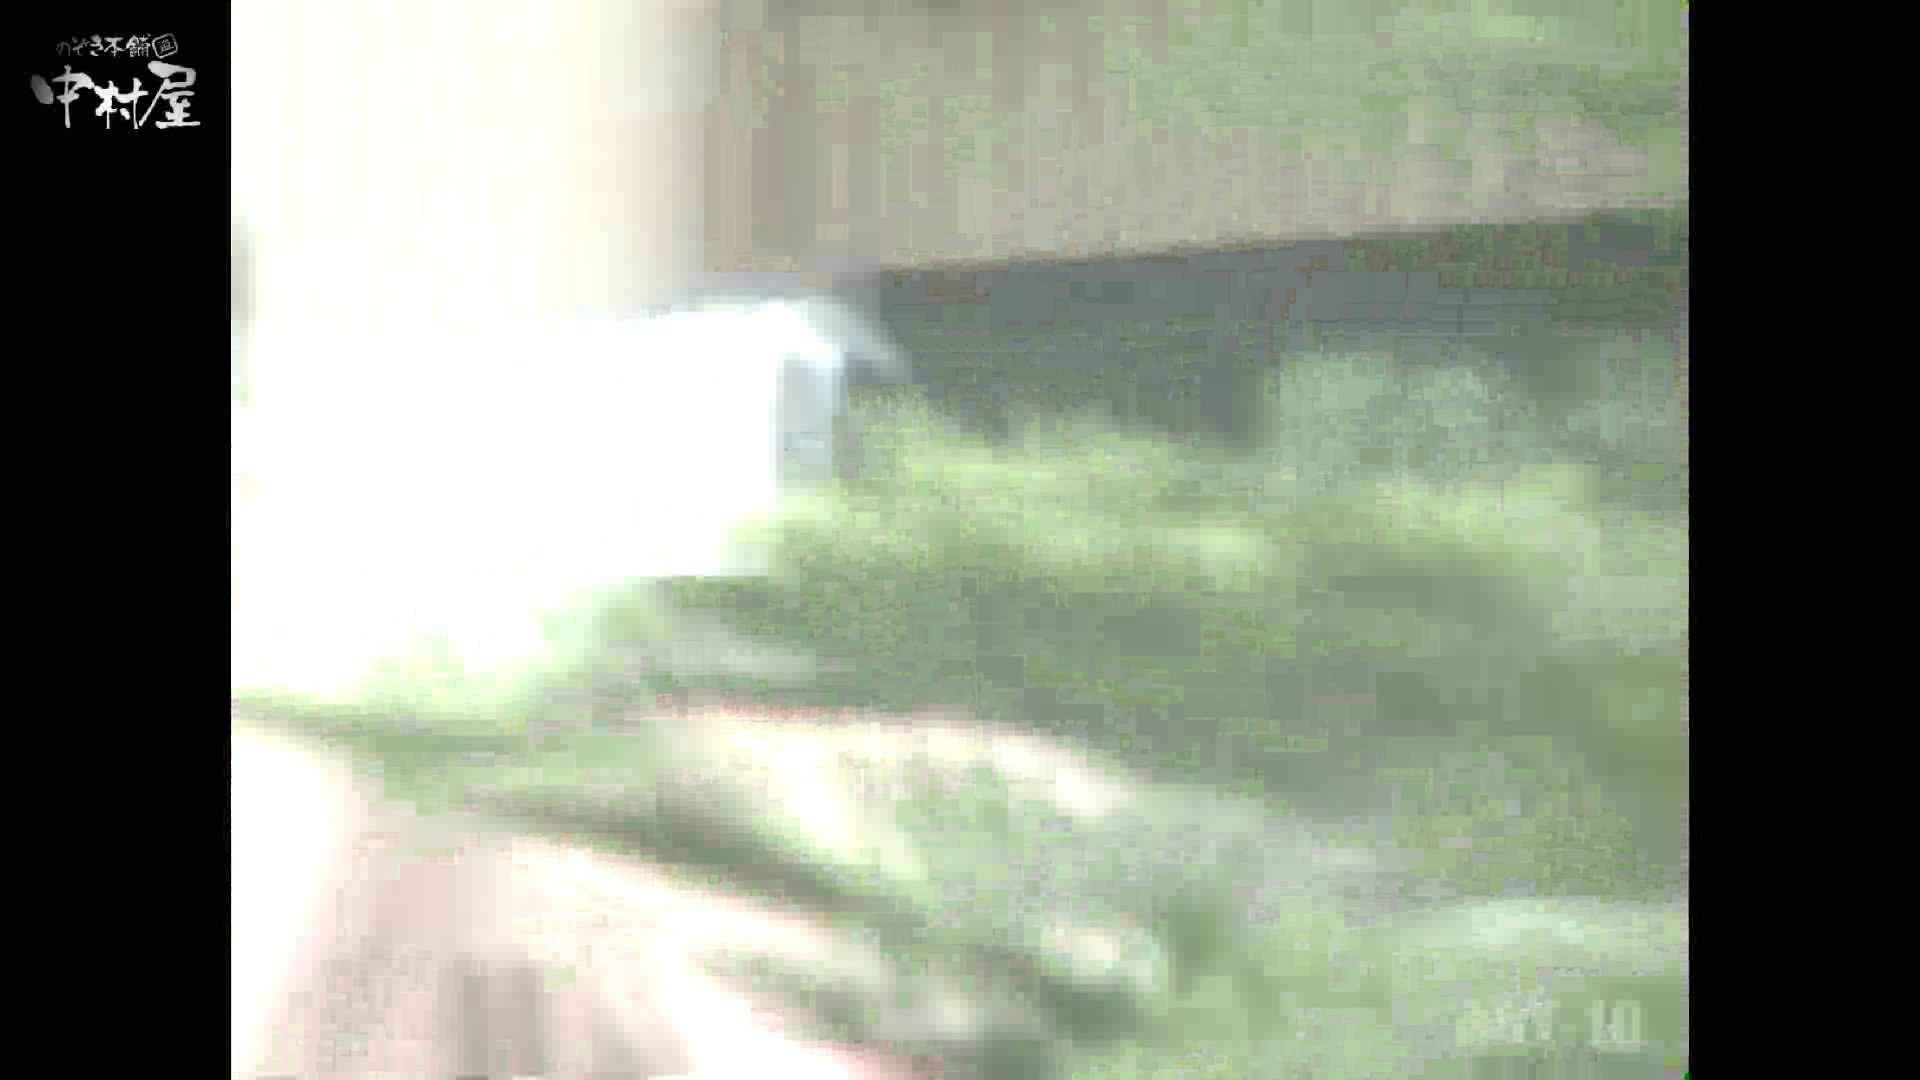 Aquaな露天風呂Vol.874潜入盗撮露天風呂十判湯 其の四 潜入   OLセックス  108画像 93